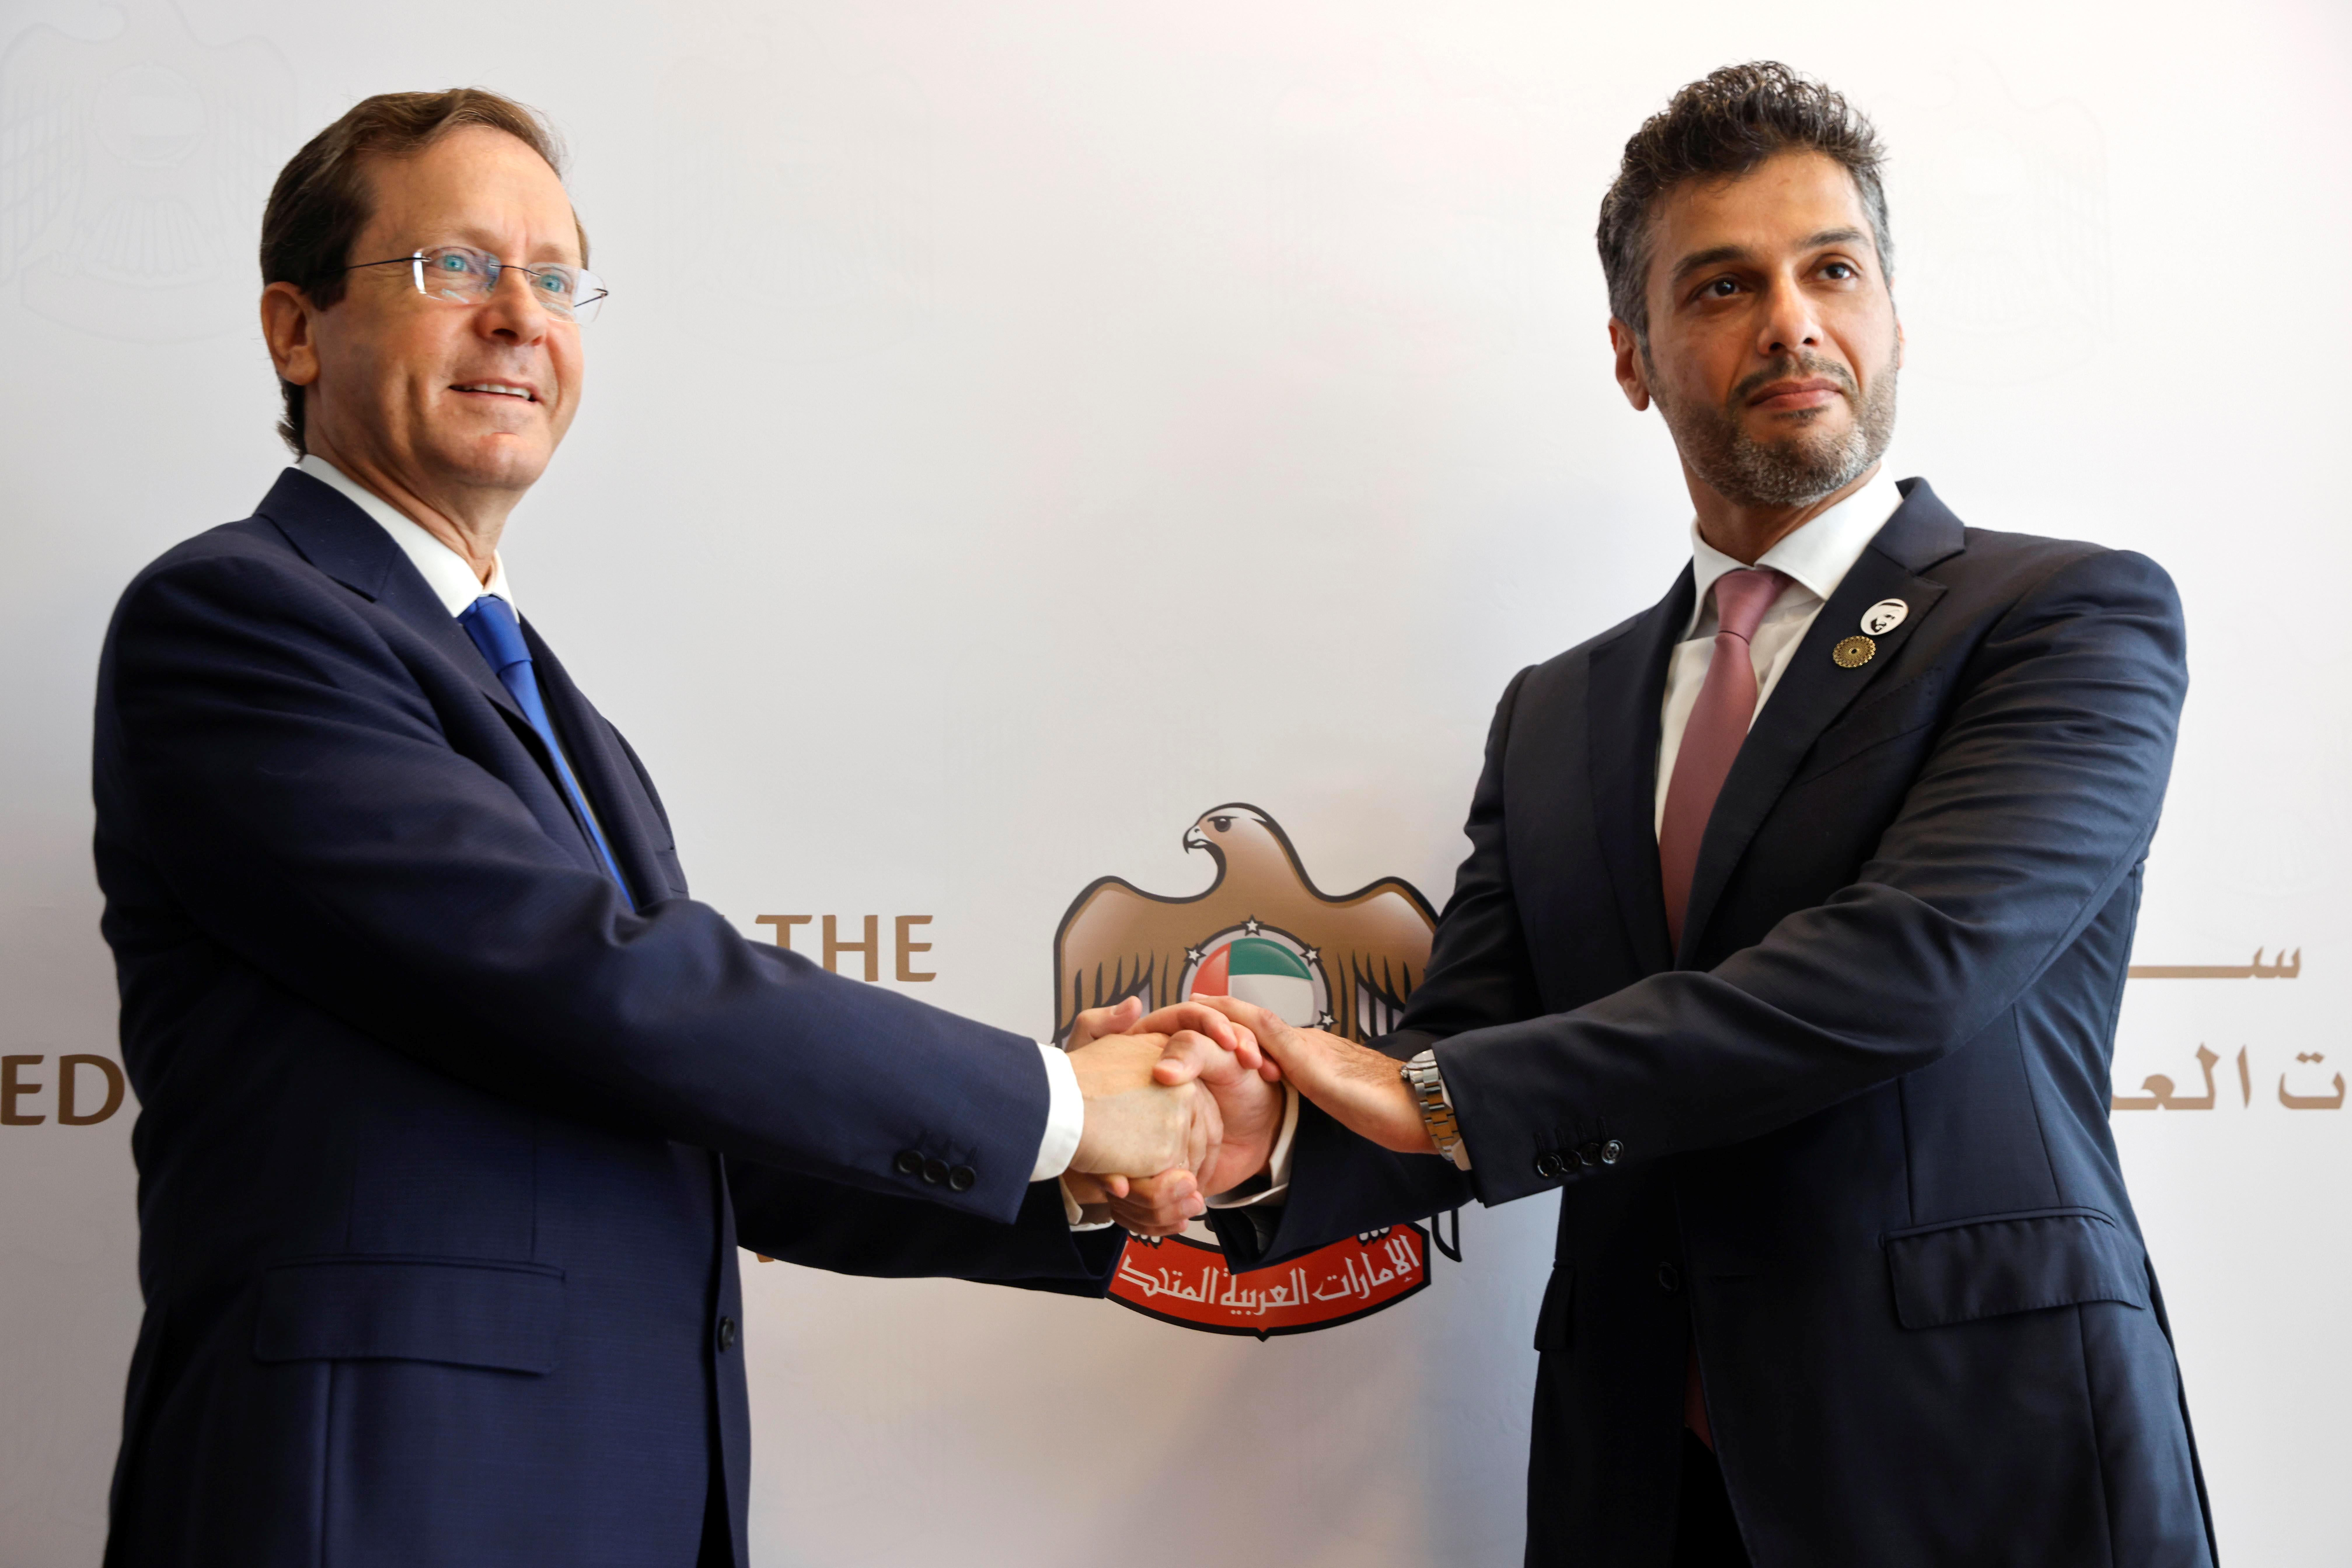 UAE Ambassador to Israel, Mohamed Al Khaja, and Israeli President Isaac Herzog shake hands during the opening ceremony of the Emirati embassy in Tel Aviv, Israel July 14, 2021. REUTERS/Amir Cohen